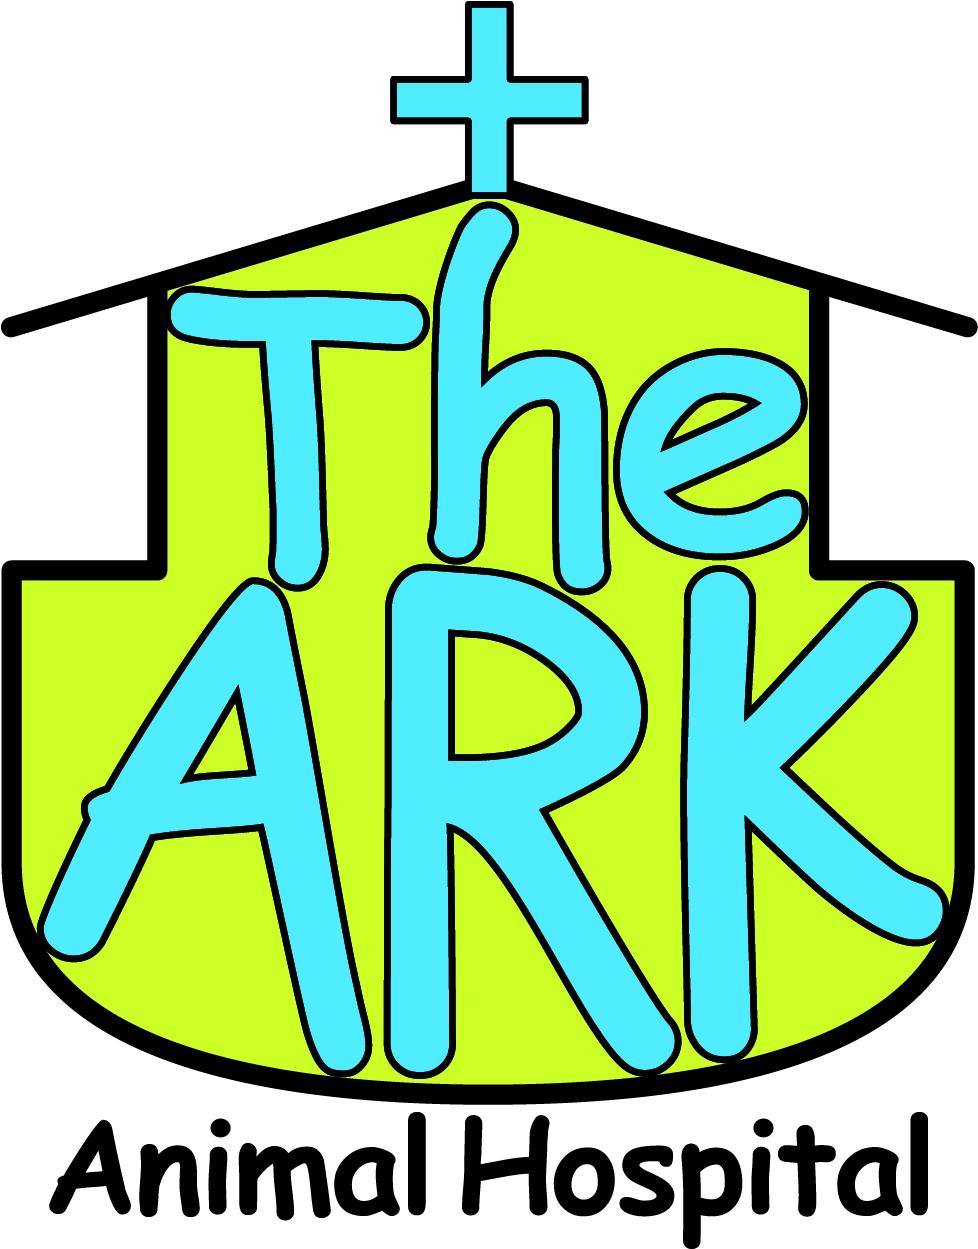 Puppy Preschool - The Ark Animal Hospital